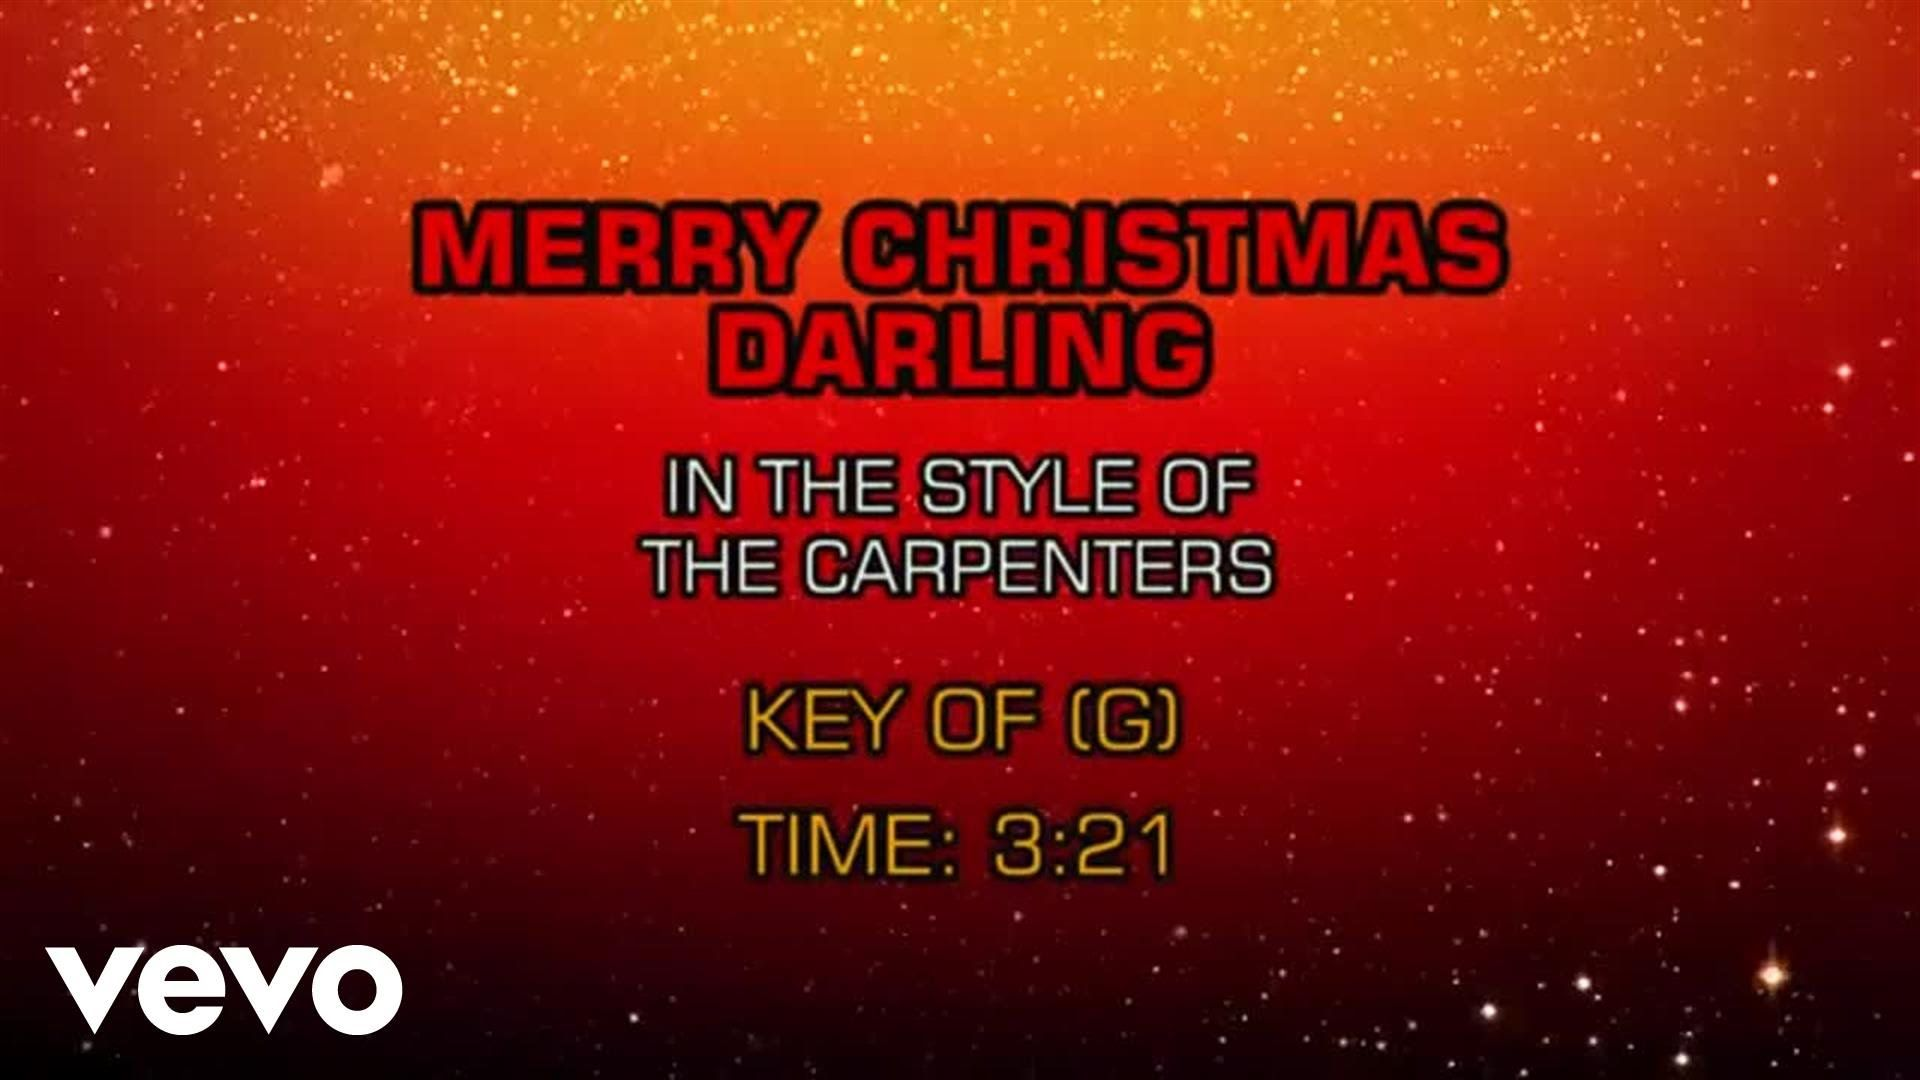 Carpenters - Merry Christmas Darling (Karaoke)   Christmas Music ...